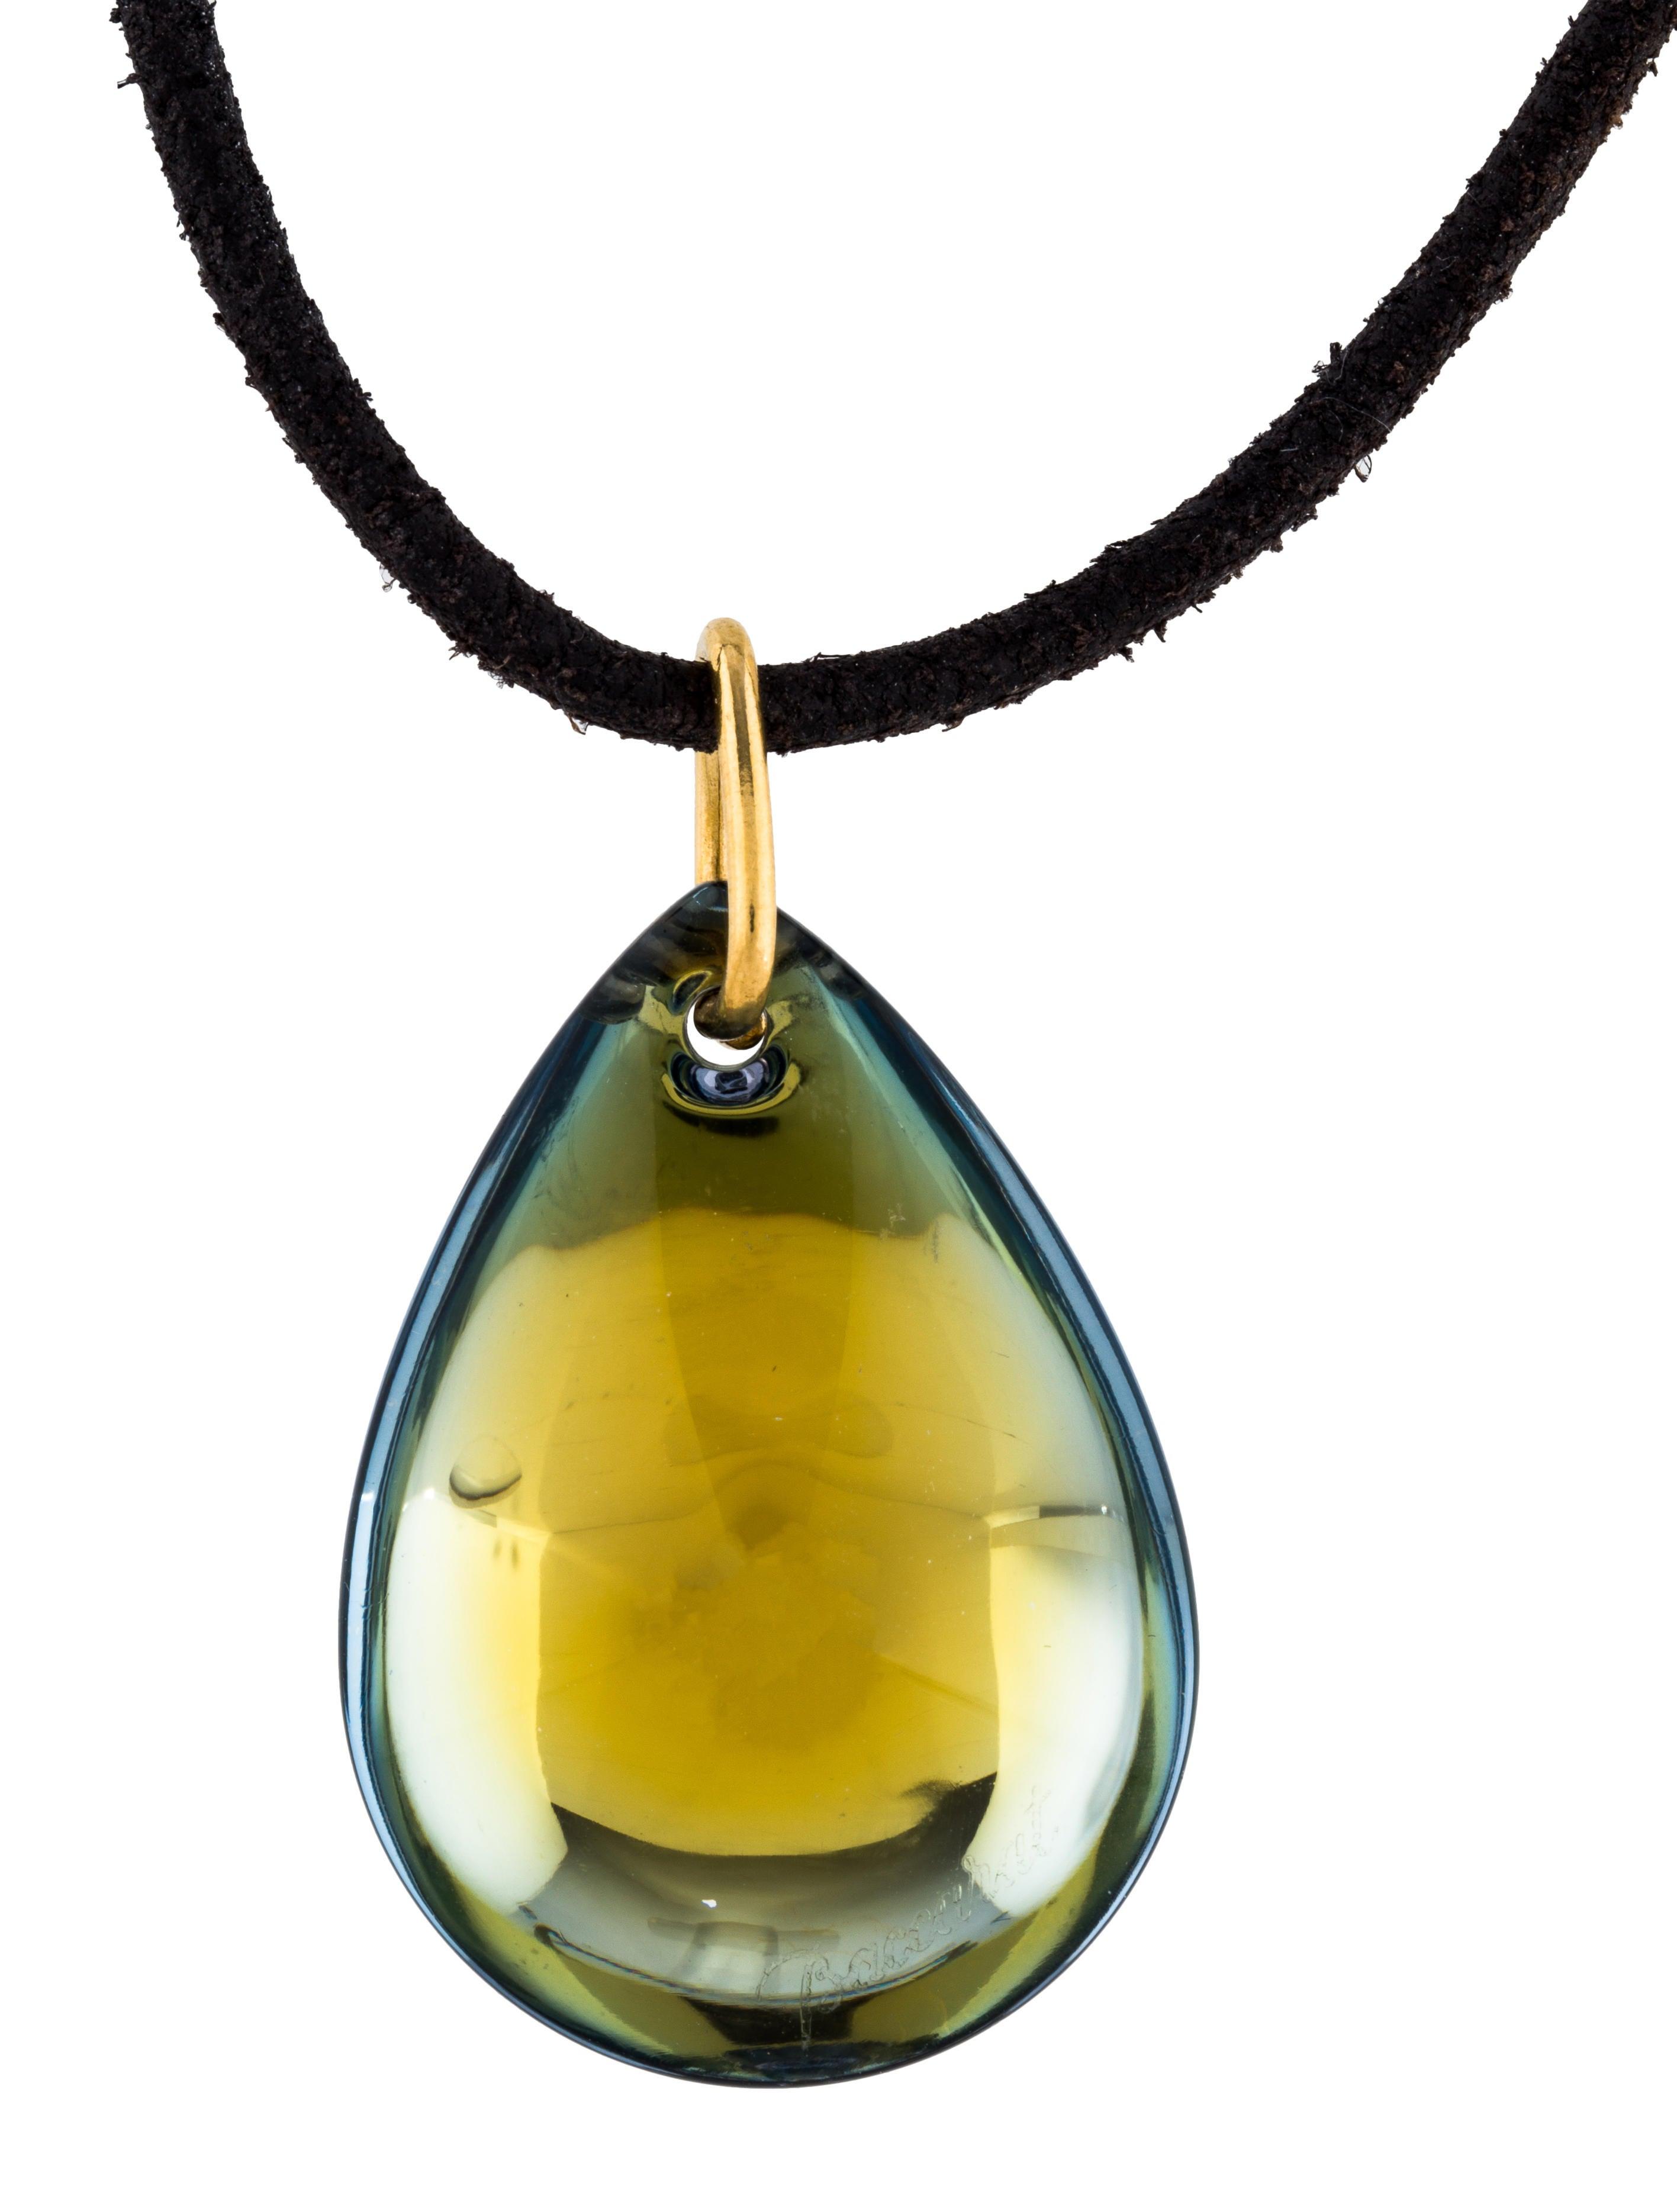 Baccarat crystal teardrop pendant necklace necklaces bcc24860 crystal teardrop pendant necklace mozeypictures Choice Image